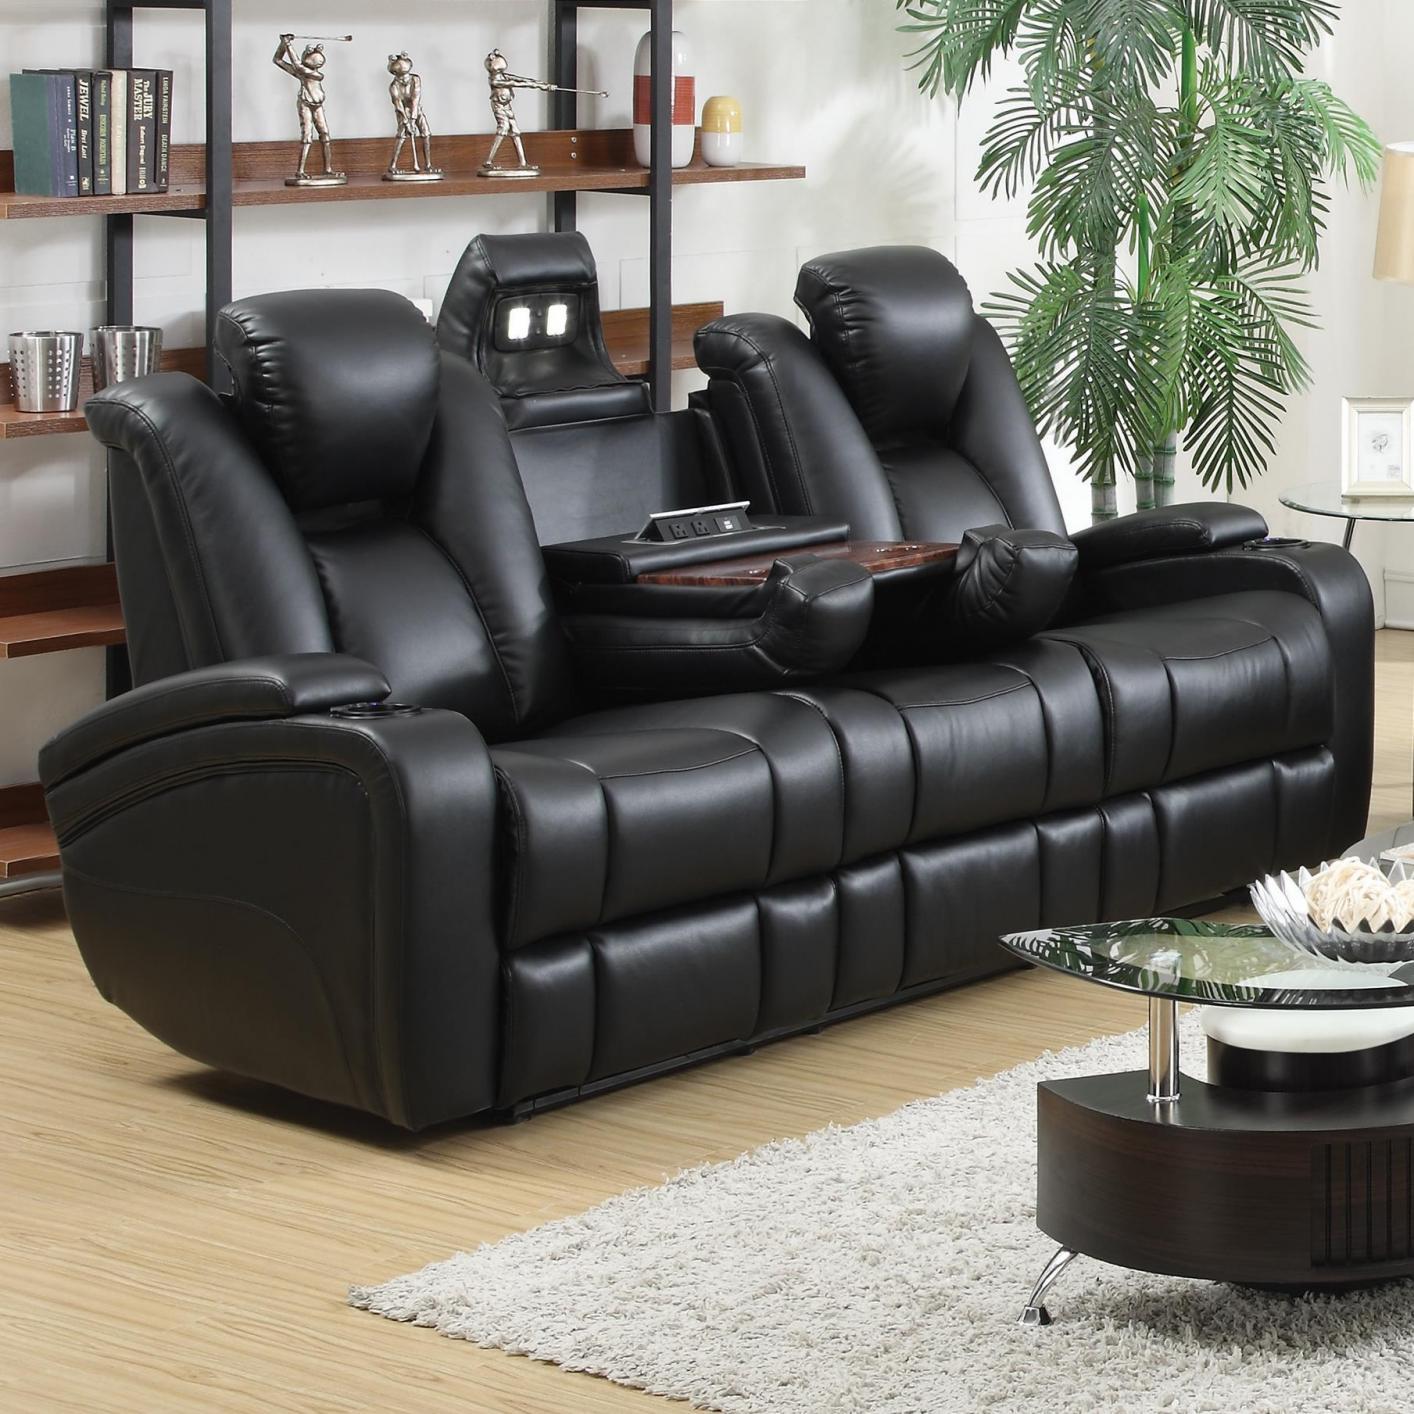 leather recliner sofa black leather power reclining sofa AKEIWXV